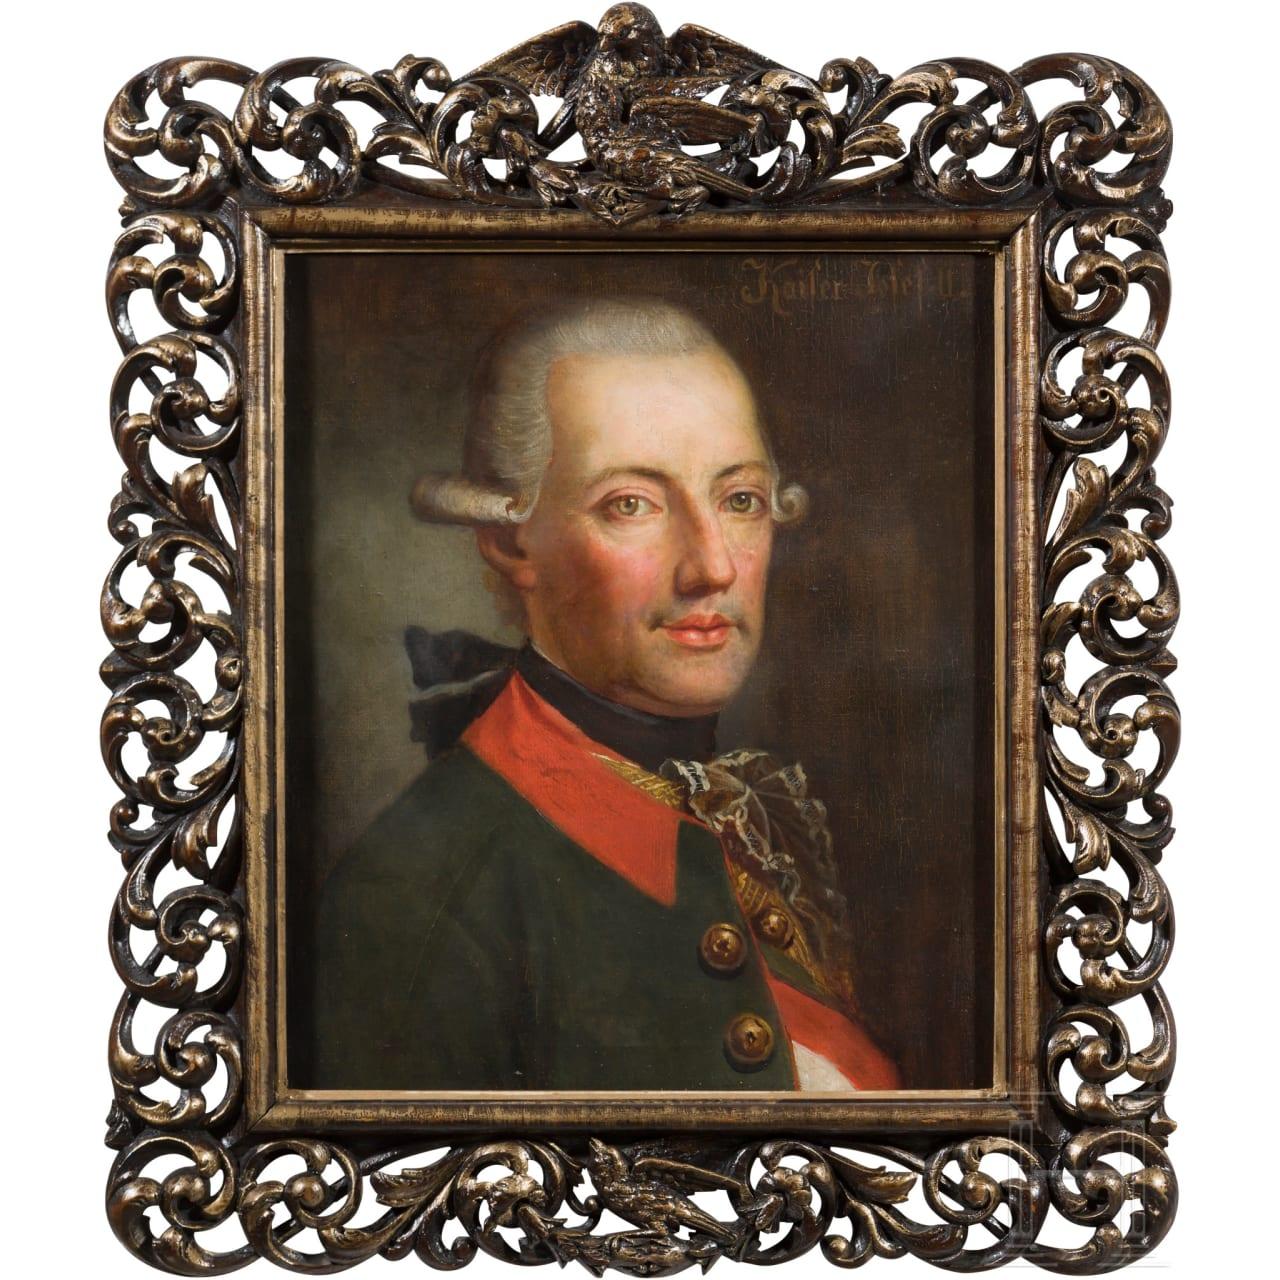 Emperor Joseph II (1741 - 1790) - breast portrait in dragoon uniform